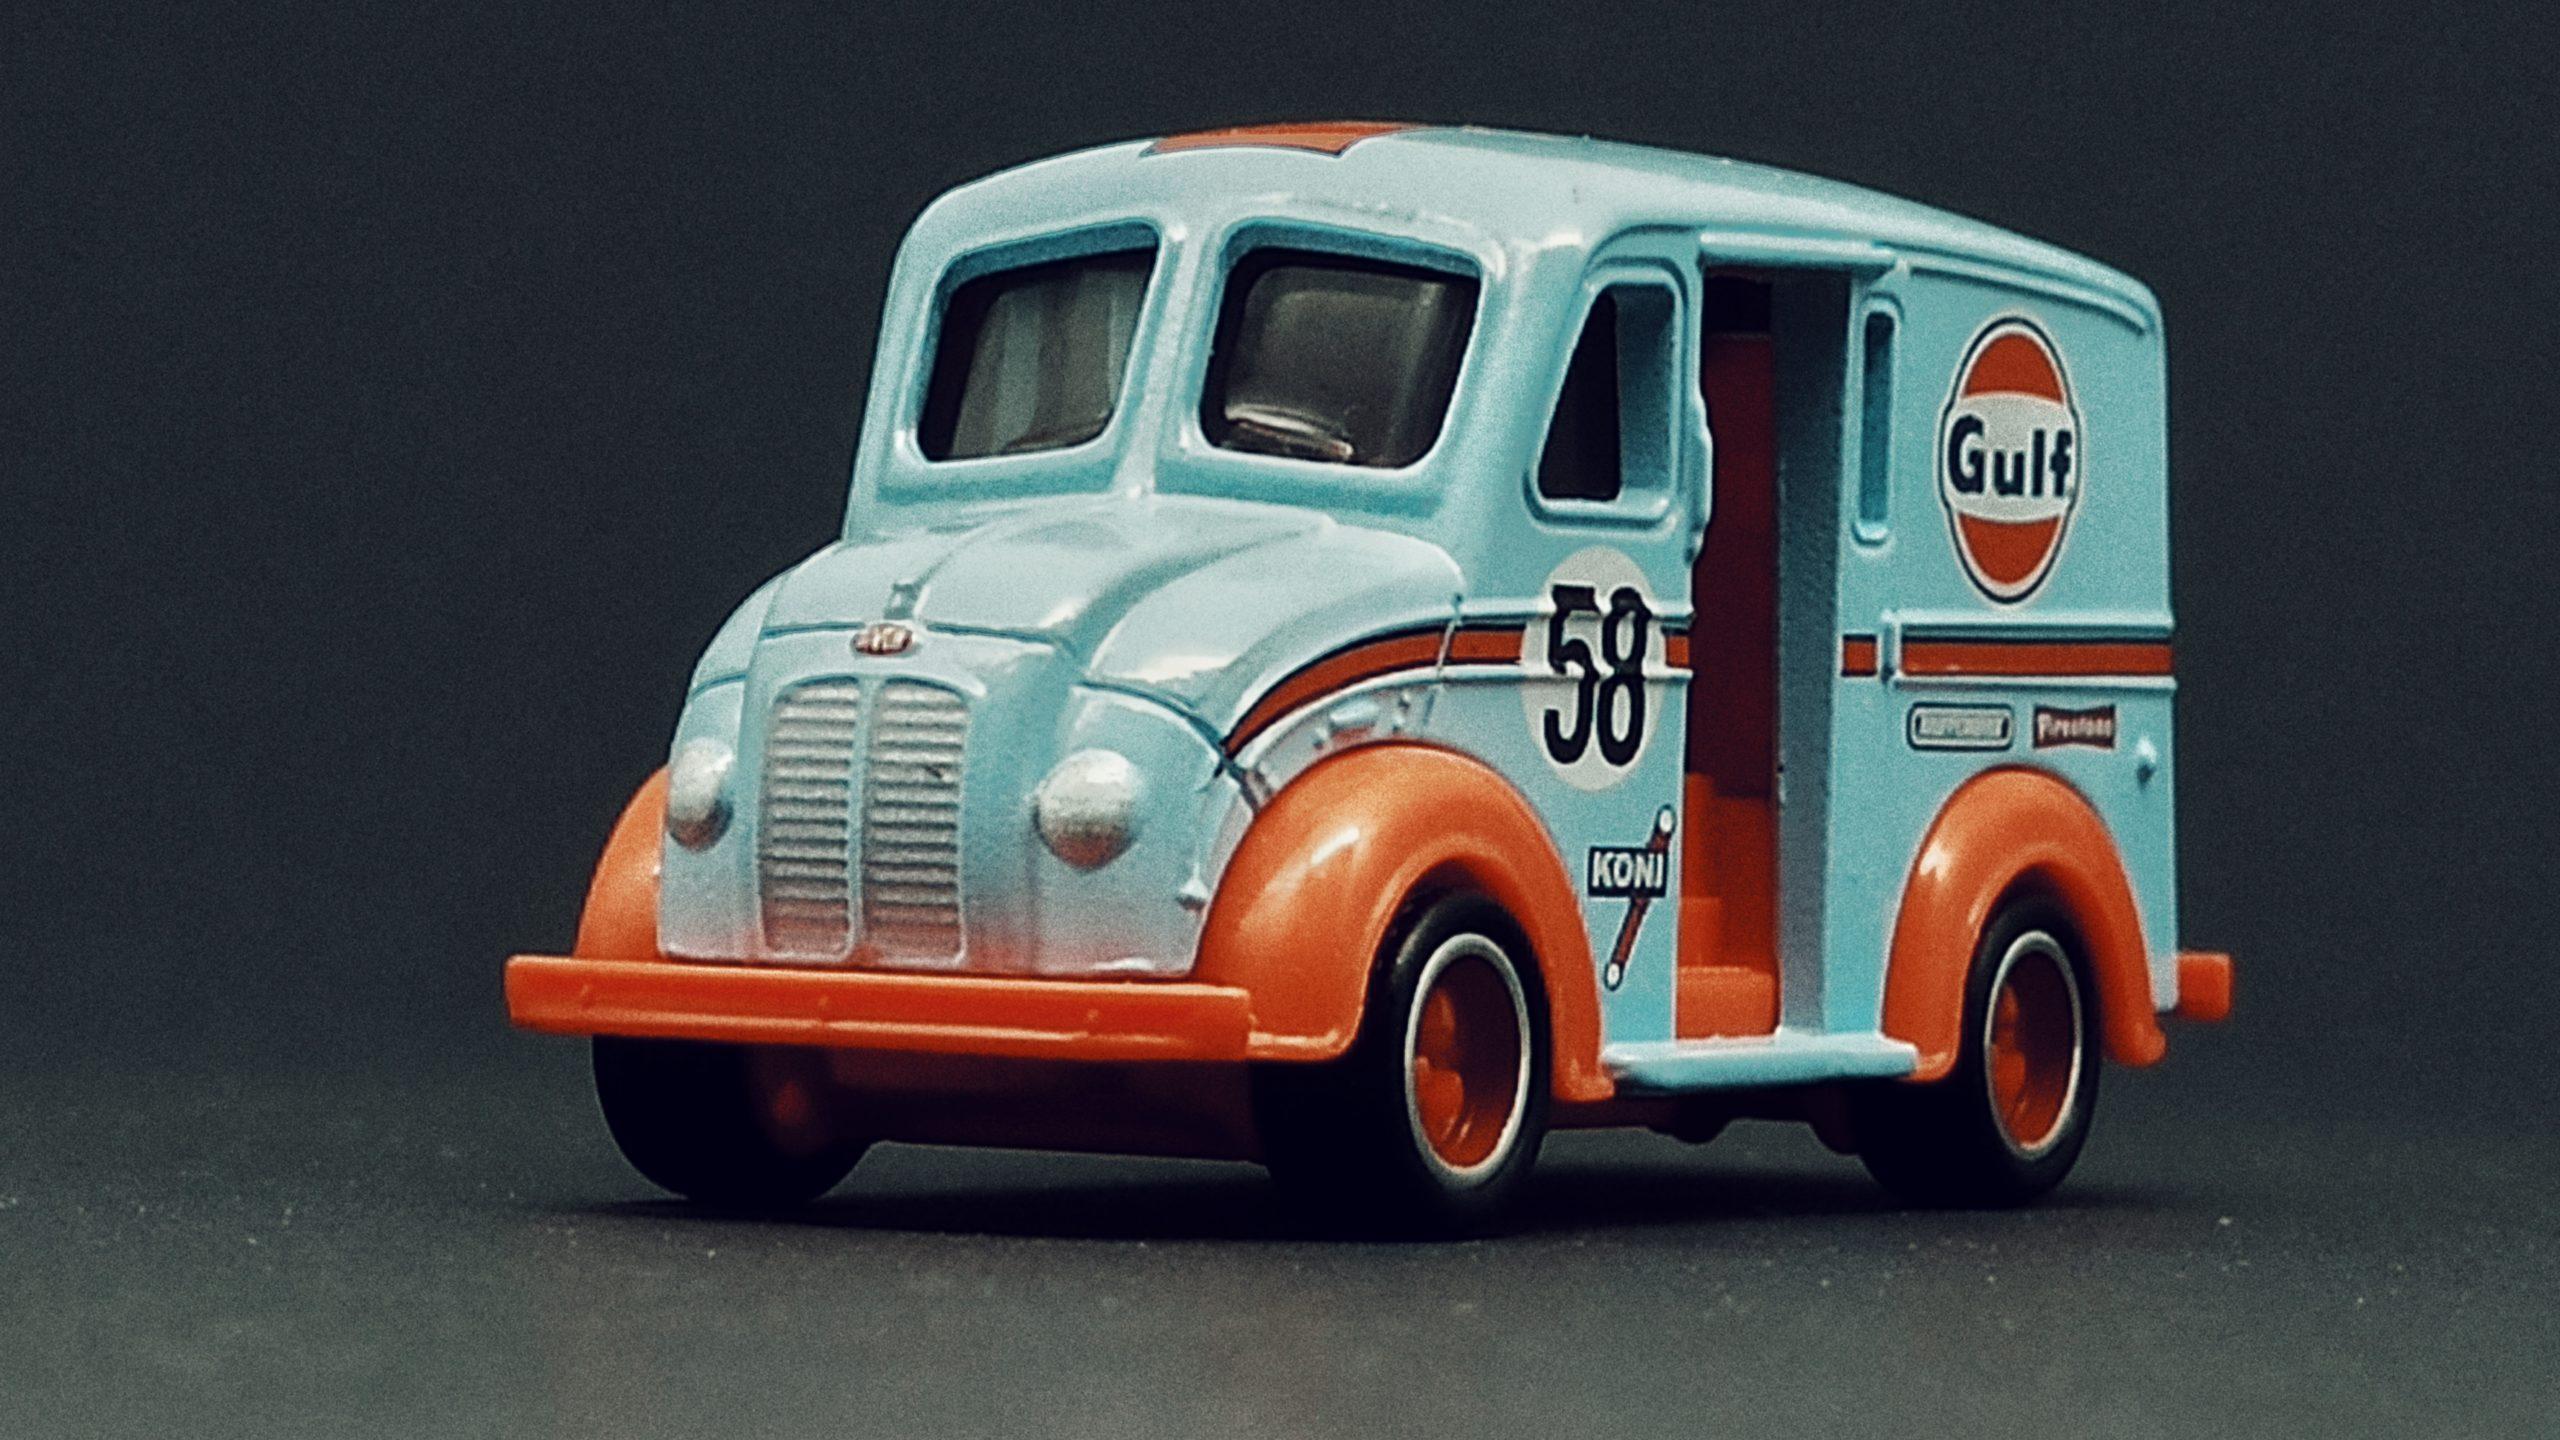 Matchbox Collectors Series Divco Milk Truck (GRK29) 2021 (12/20) light blue MBX Gulf side angle